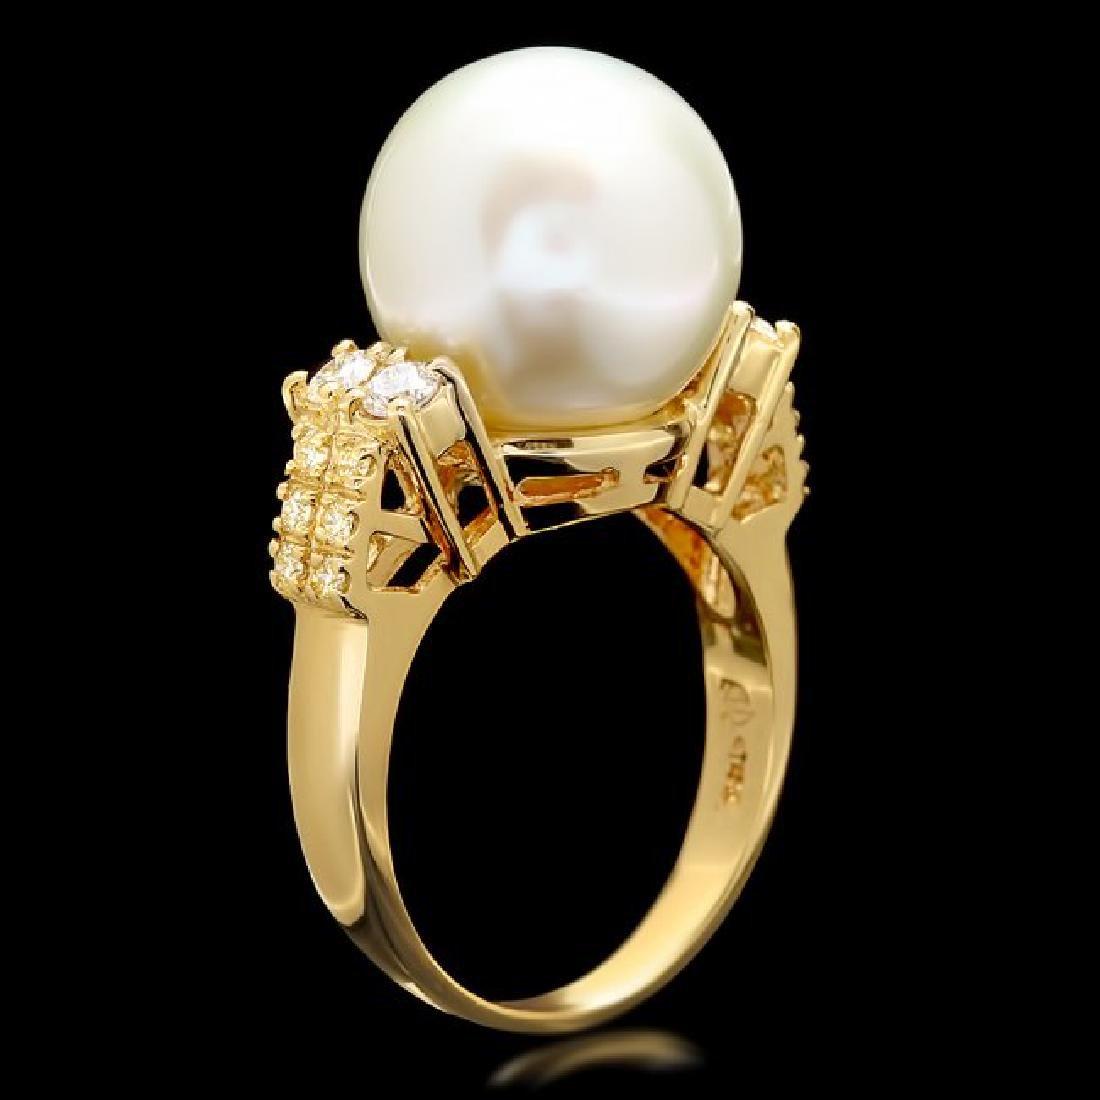 14k Yellow Gold 13mm Pearl 0.60ct Diamond Ring - 3